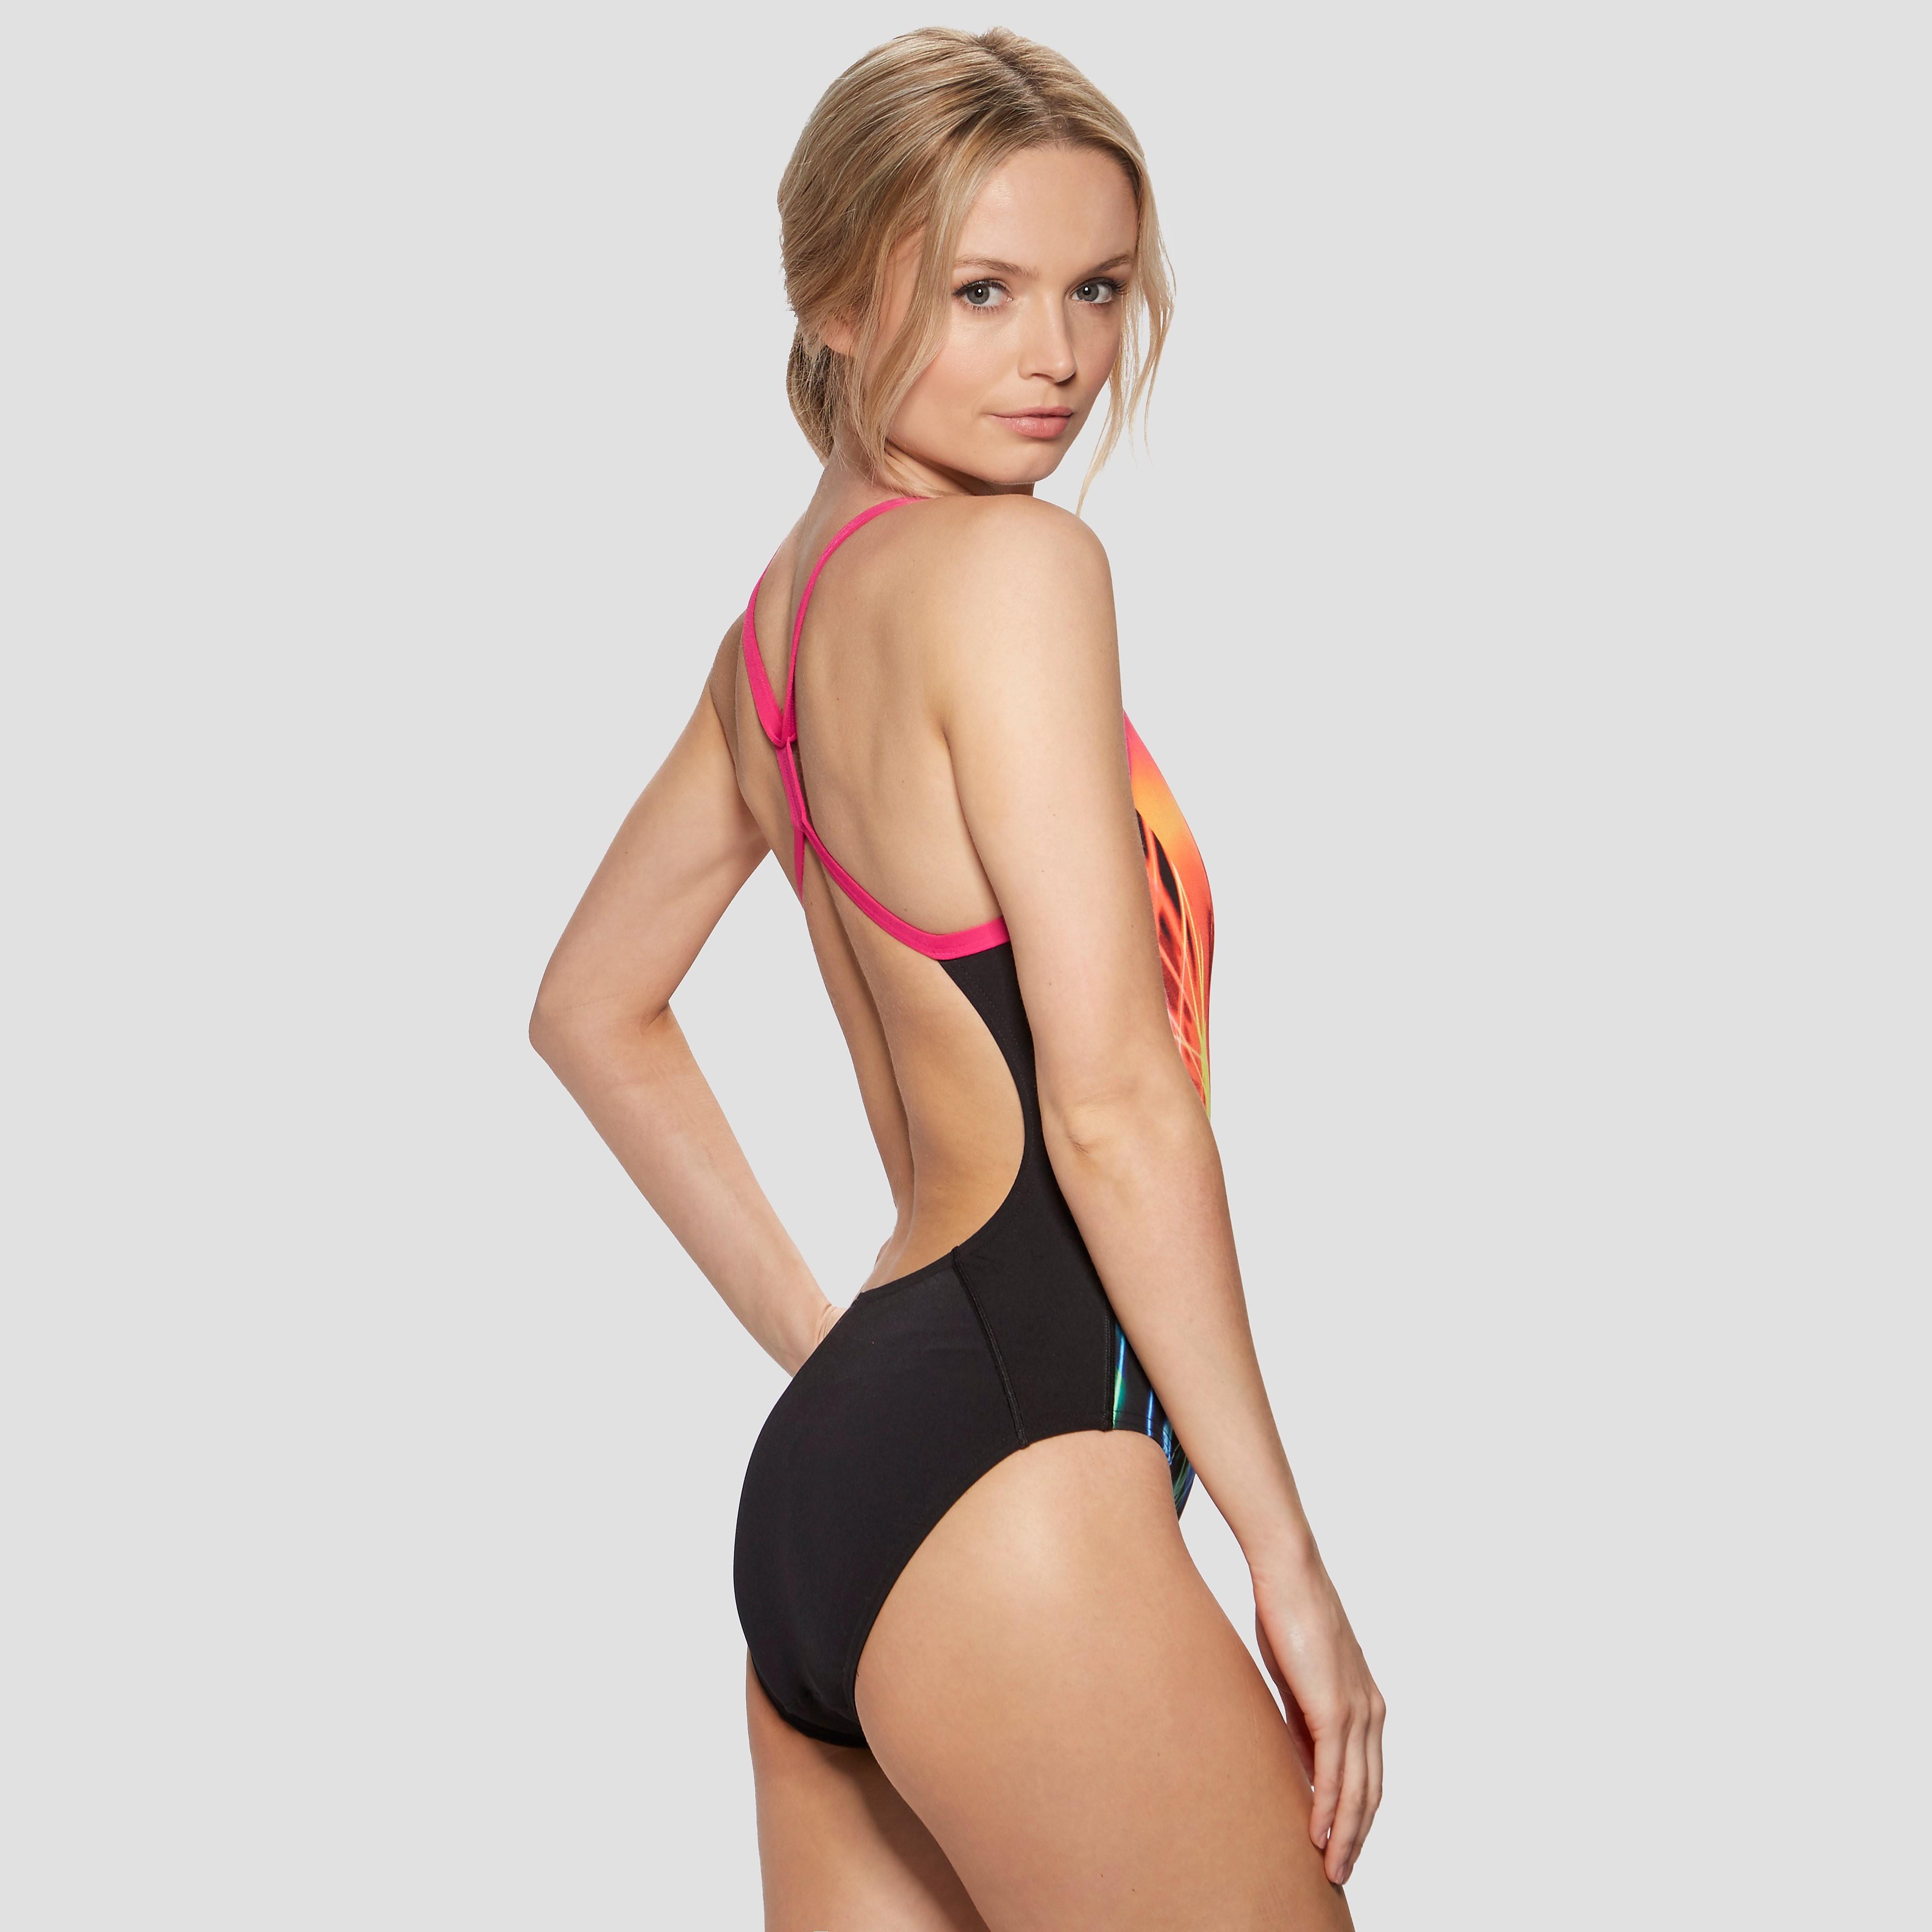 Speedo Prismstorm Placement Digital Rippleback Women's Swimsuit